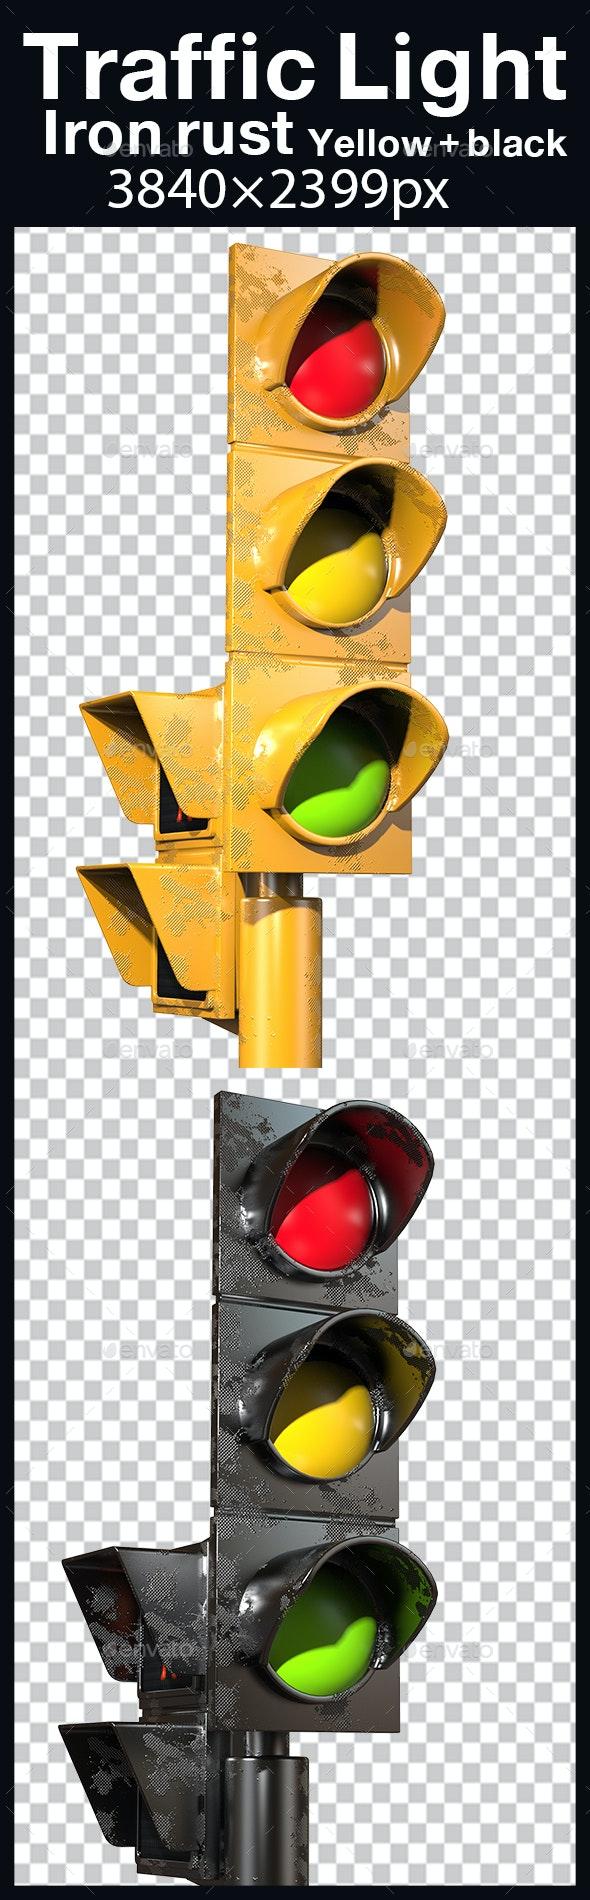 Traffic Light Iron Rust - Objects 3D Renders